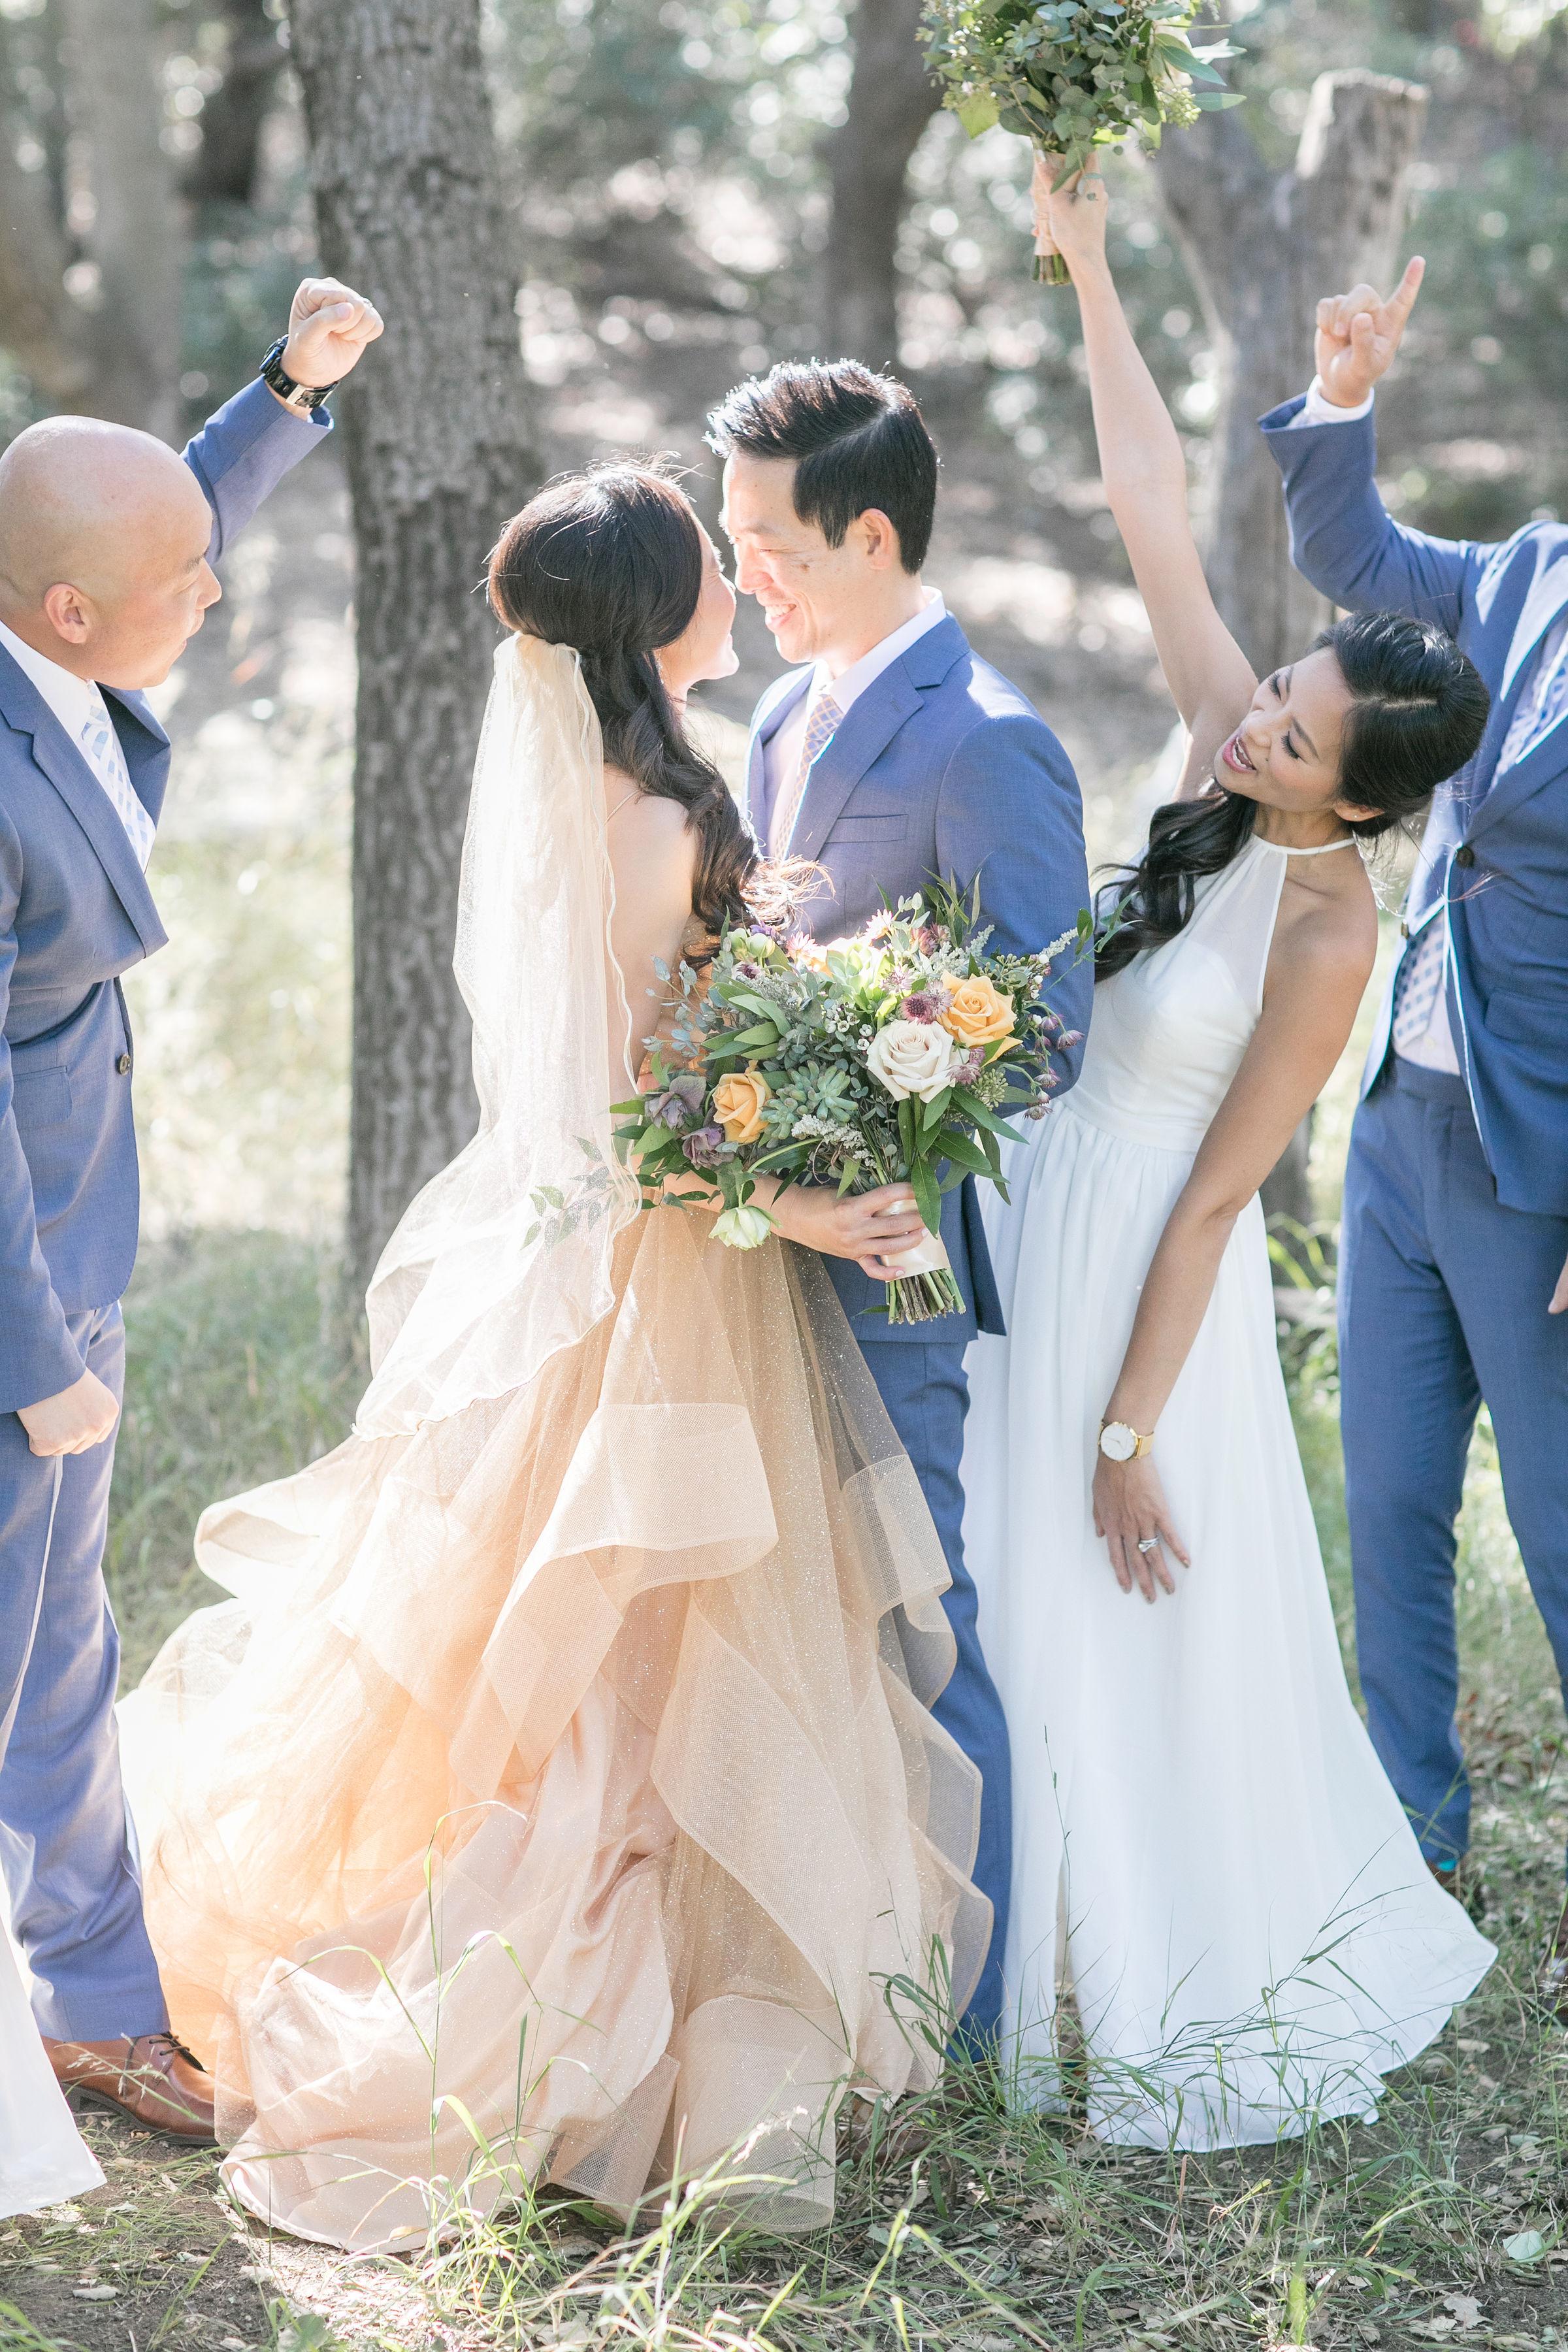 Melanie+Seiji-saddlerockranch-malibucaliforniawedding-couplesportraitsandweddingparty-0064.jpg